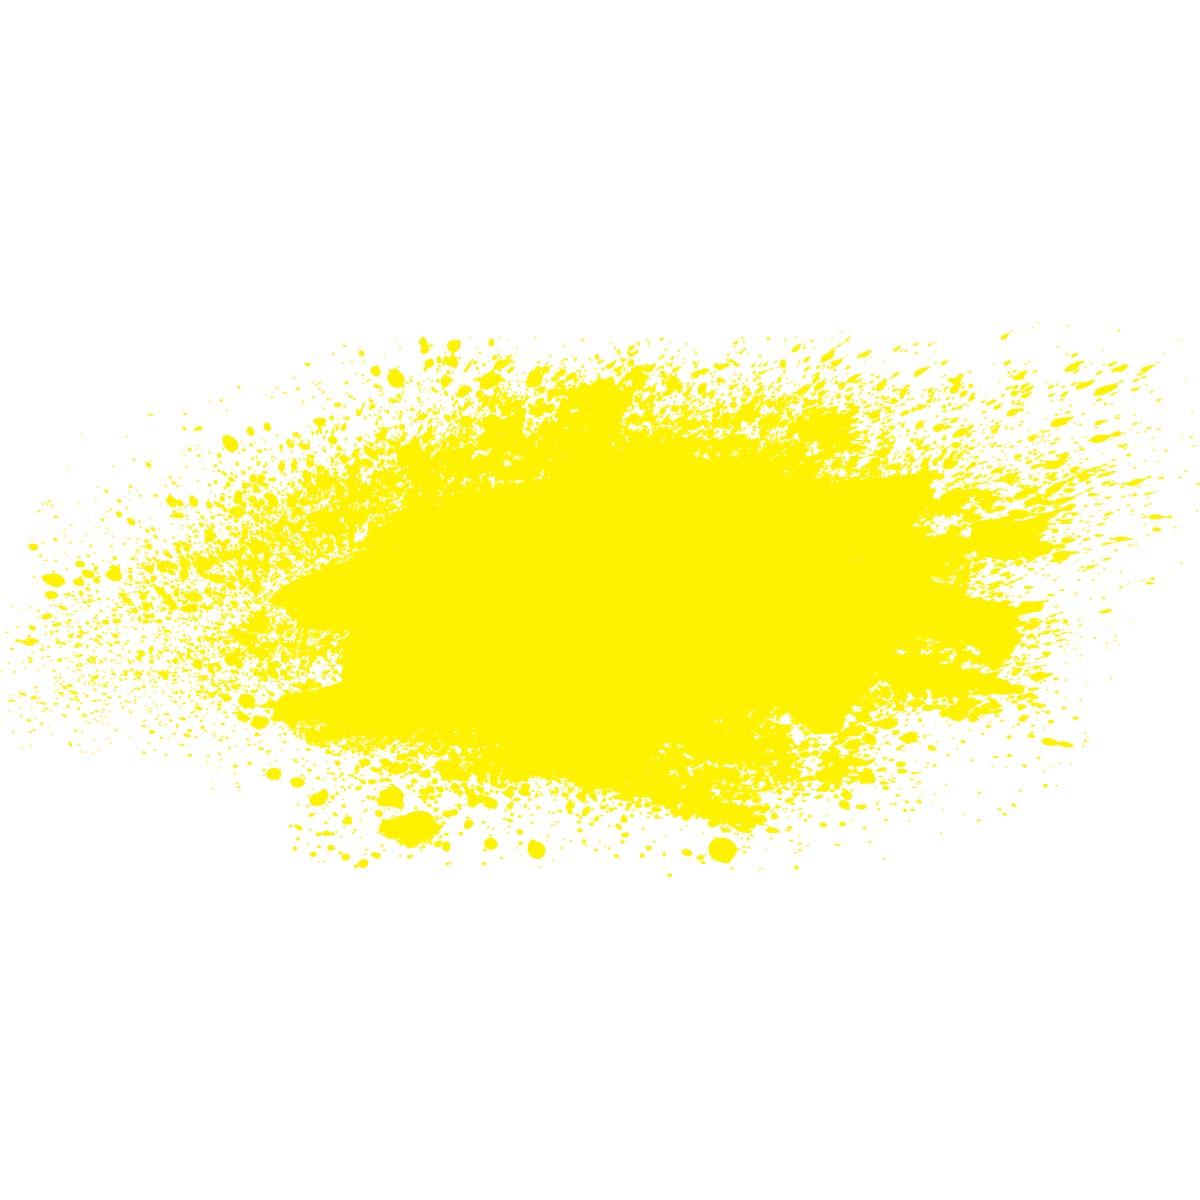 FolkArt ® Stencil Spray™ Acrylic Paint - Yellow, 2 oz.